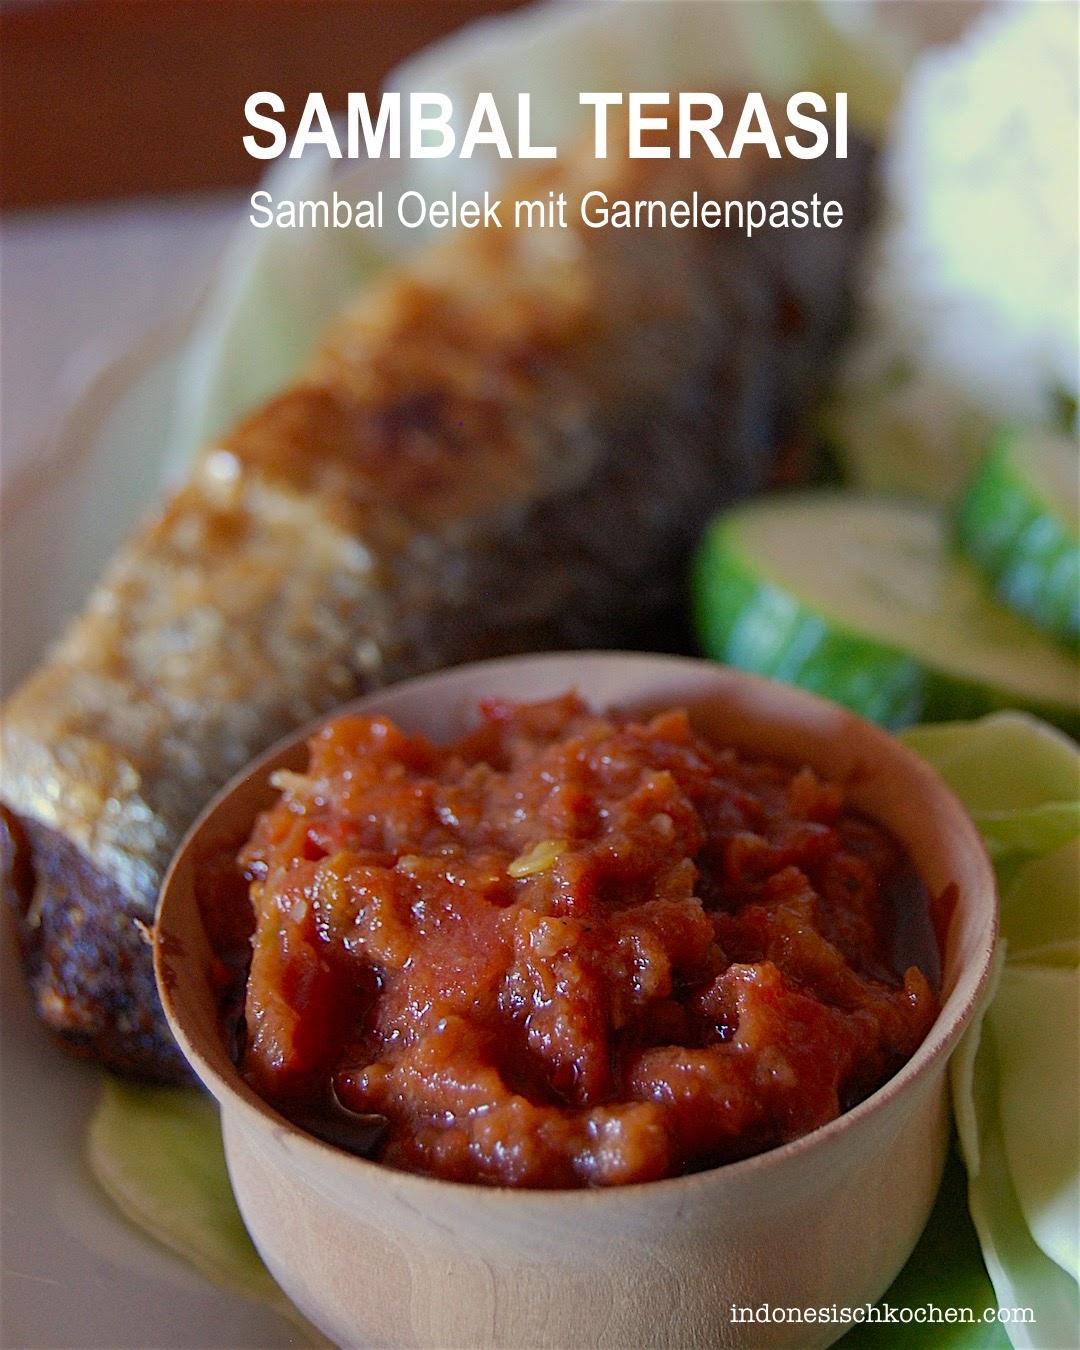 Rezept Sambal Oelek mit Garnelenpaste, Sambal Terasi balinesisch kochen